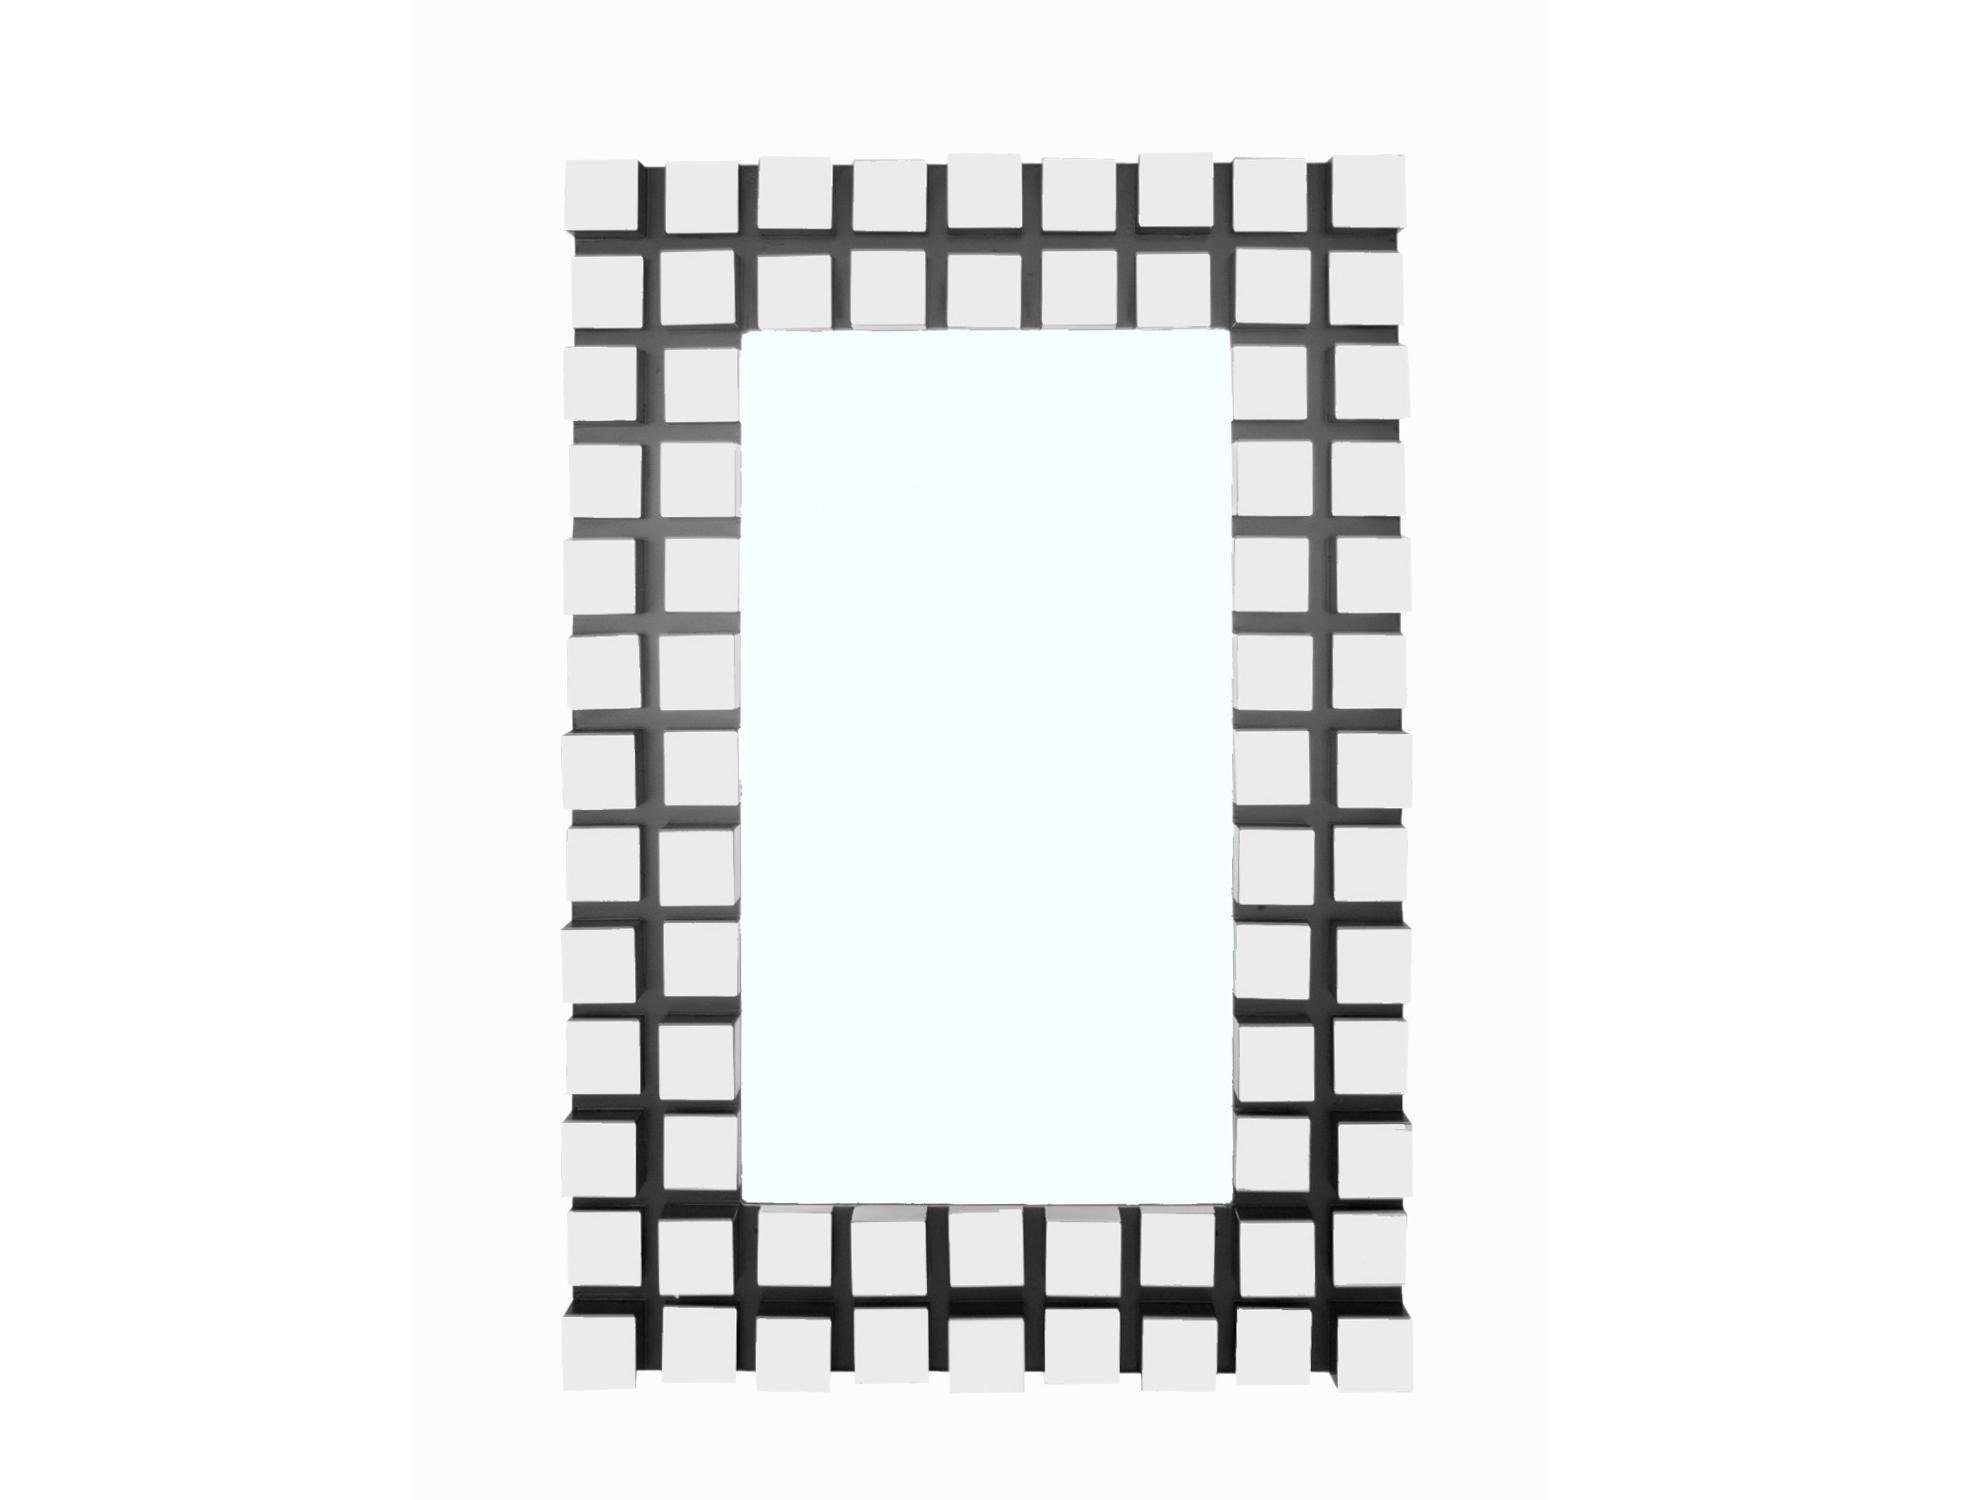 Зеркало PalmerНастенные зеркала<br><br><br>Material: Металл<br>Ширина см: 80<br>Высота см: 120<br>Глубина см: 10